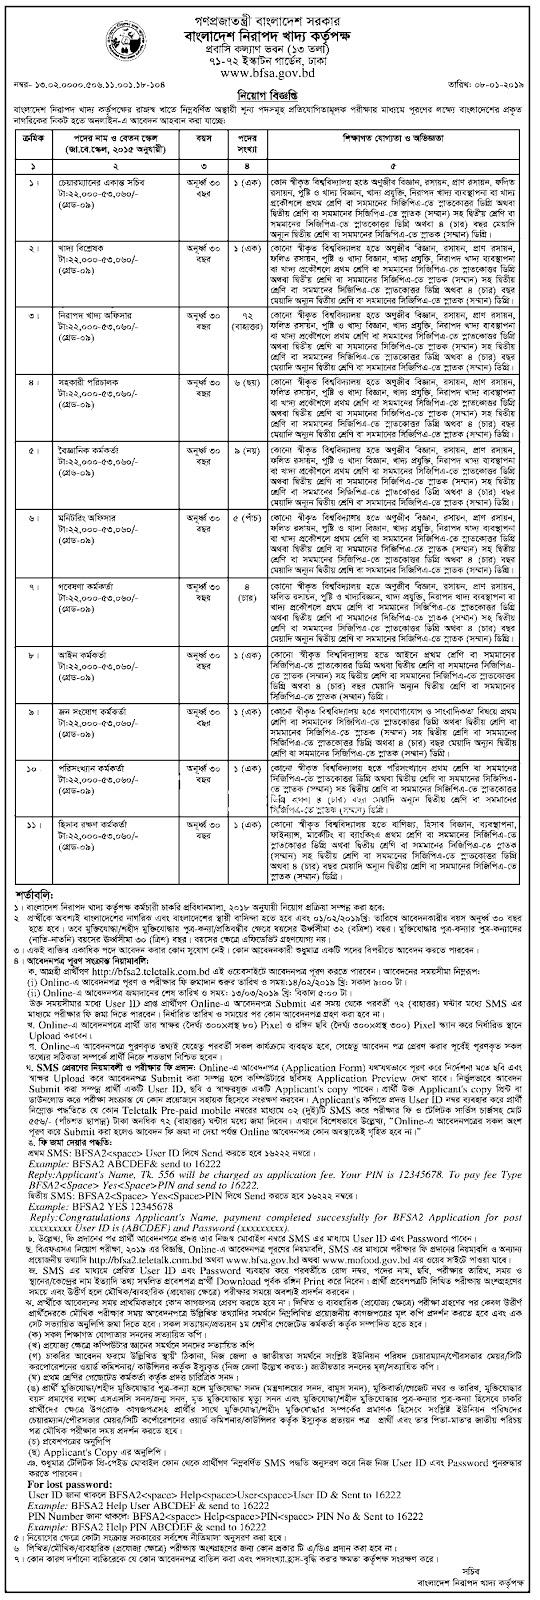 Bangladesh Food Safety Authority (BFSA) Job Circular 2019